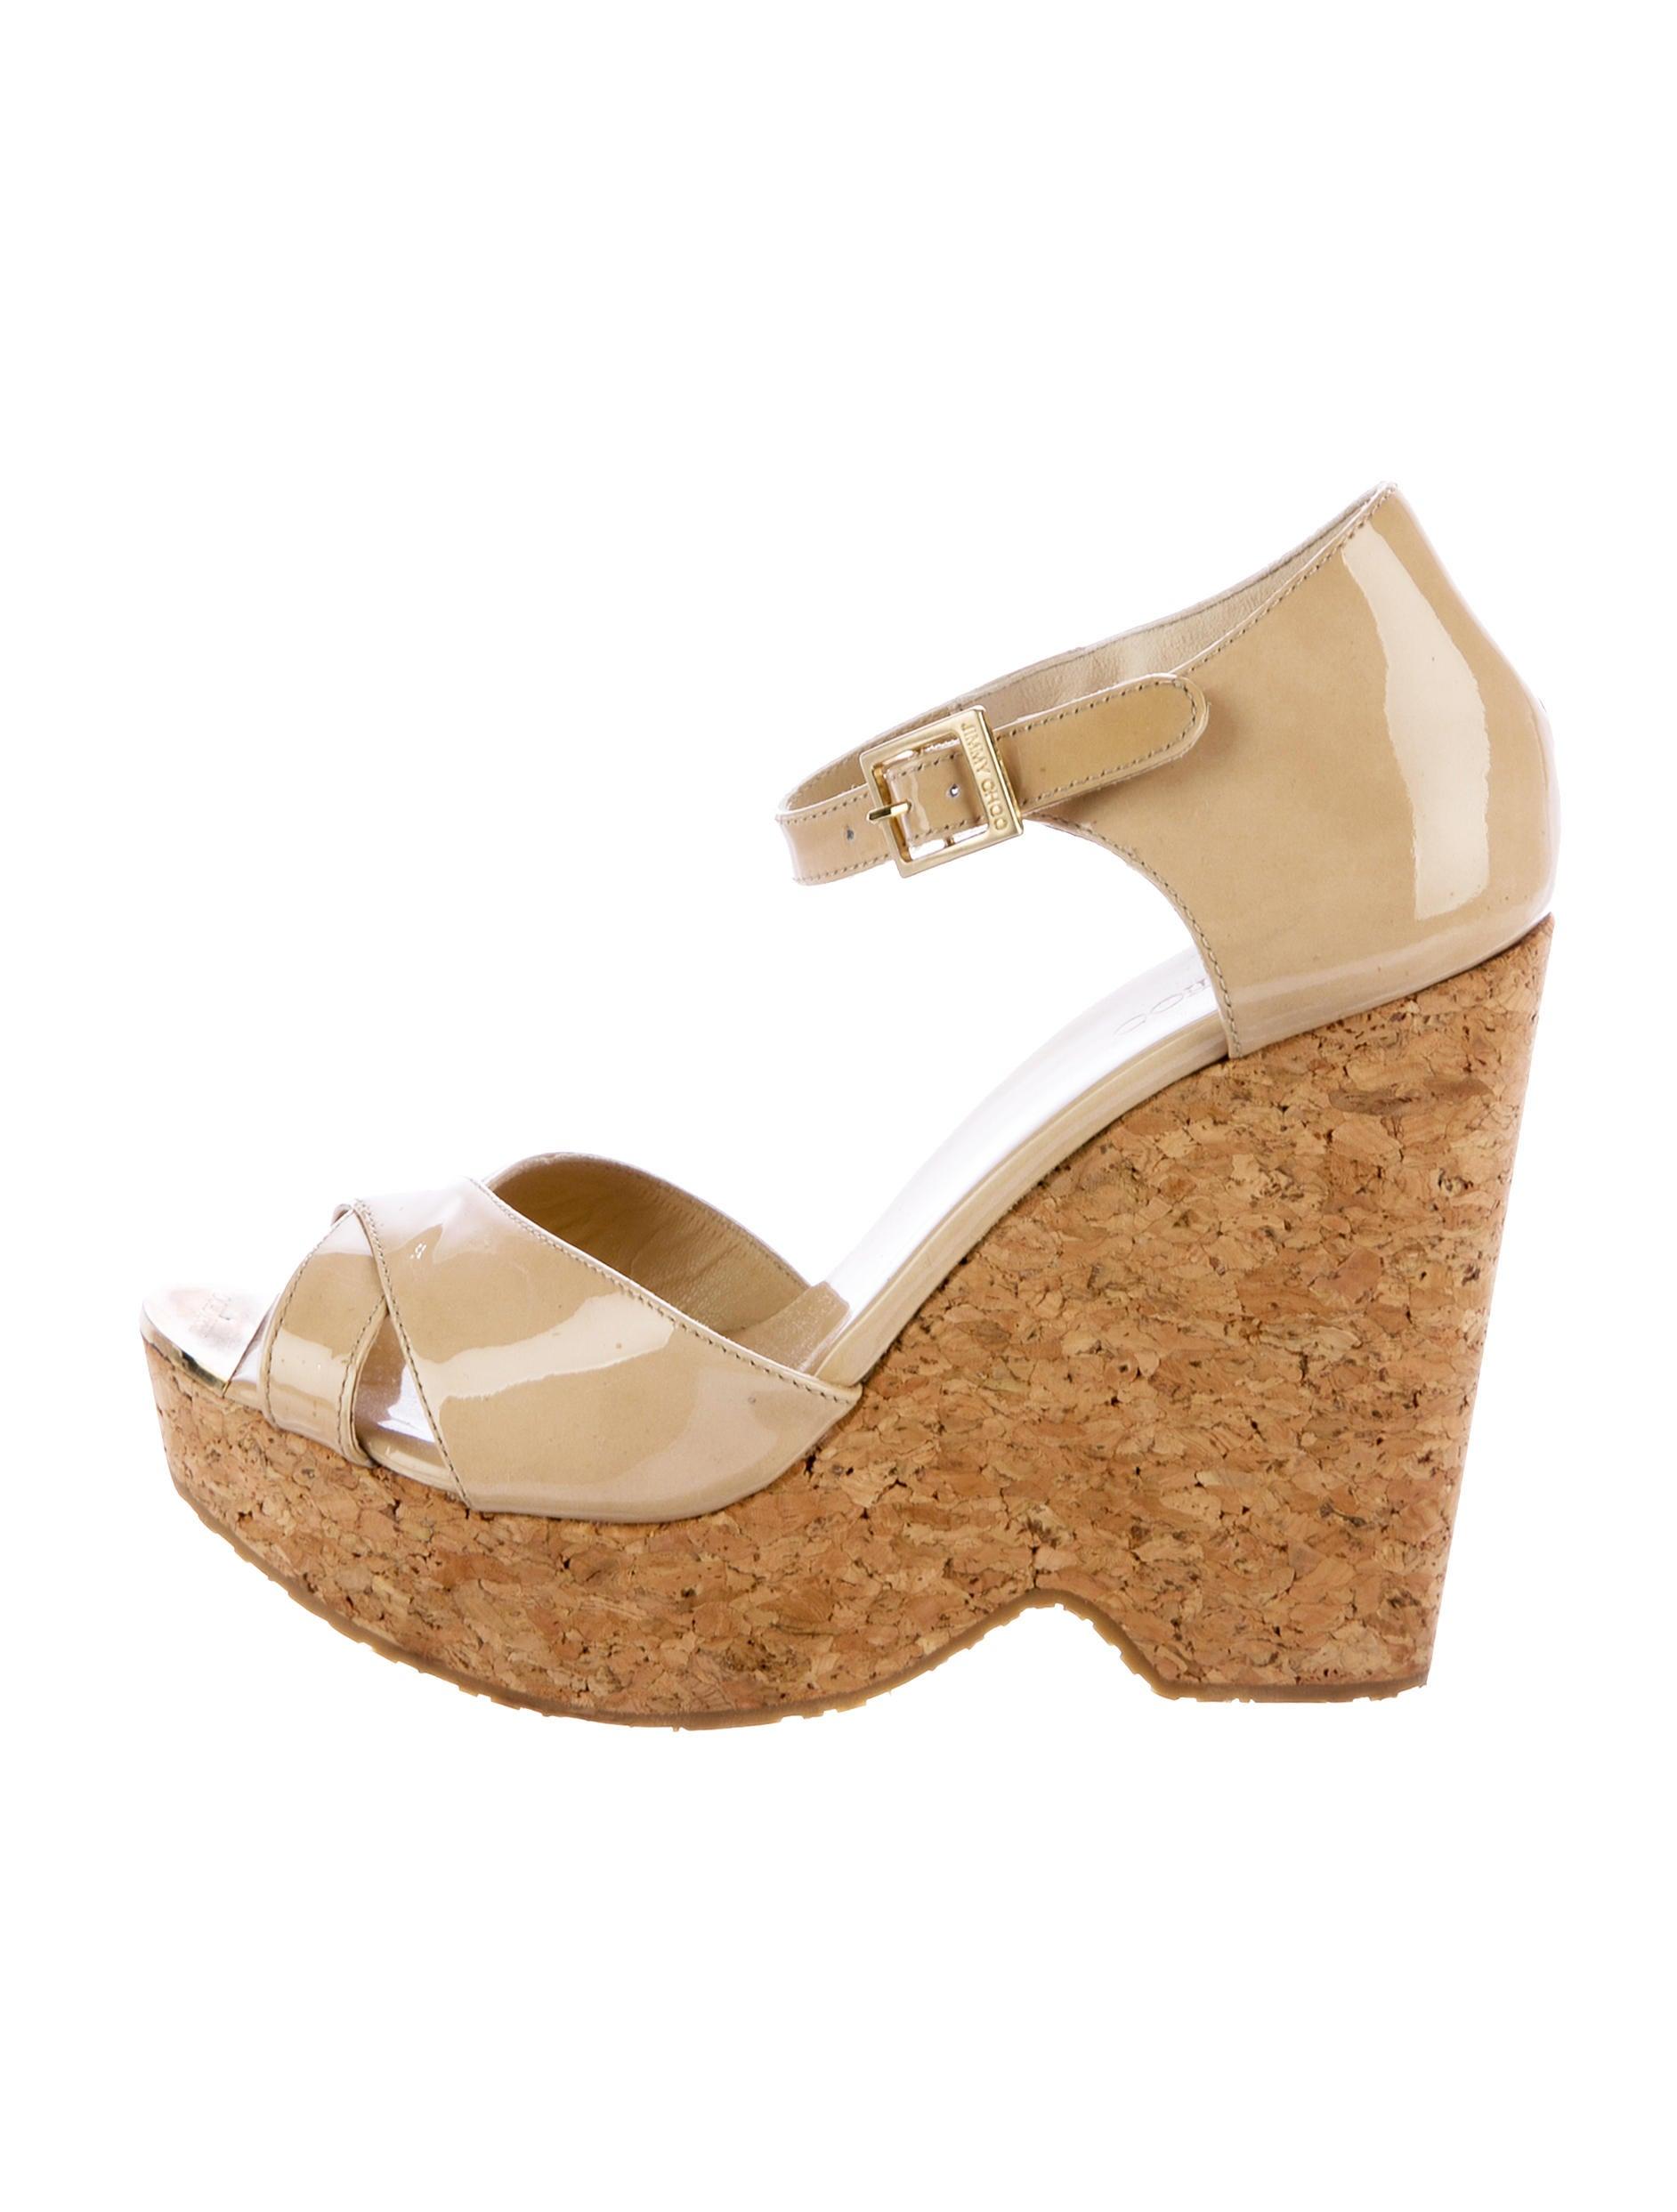 jimmy choo platform patent leather sandals shoes